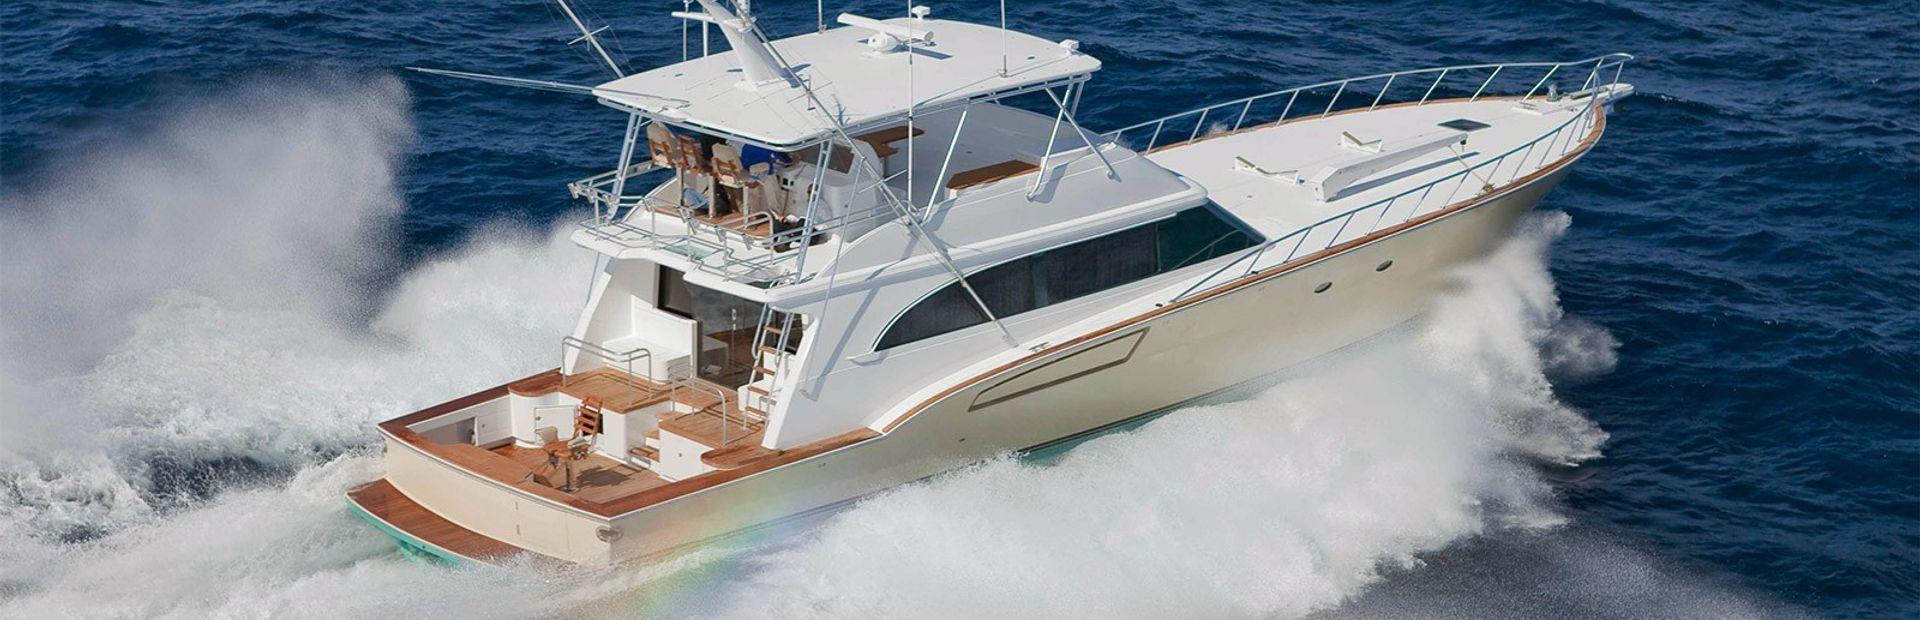 Donzi R-80 Yacht Charter